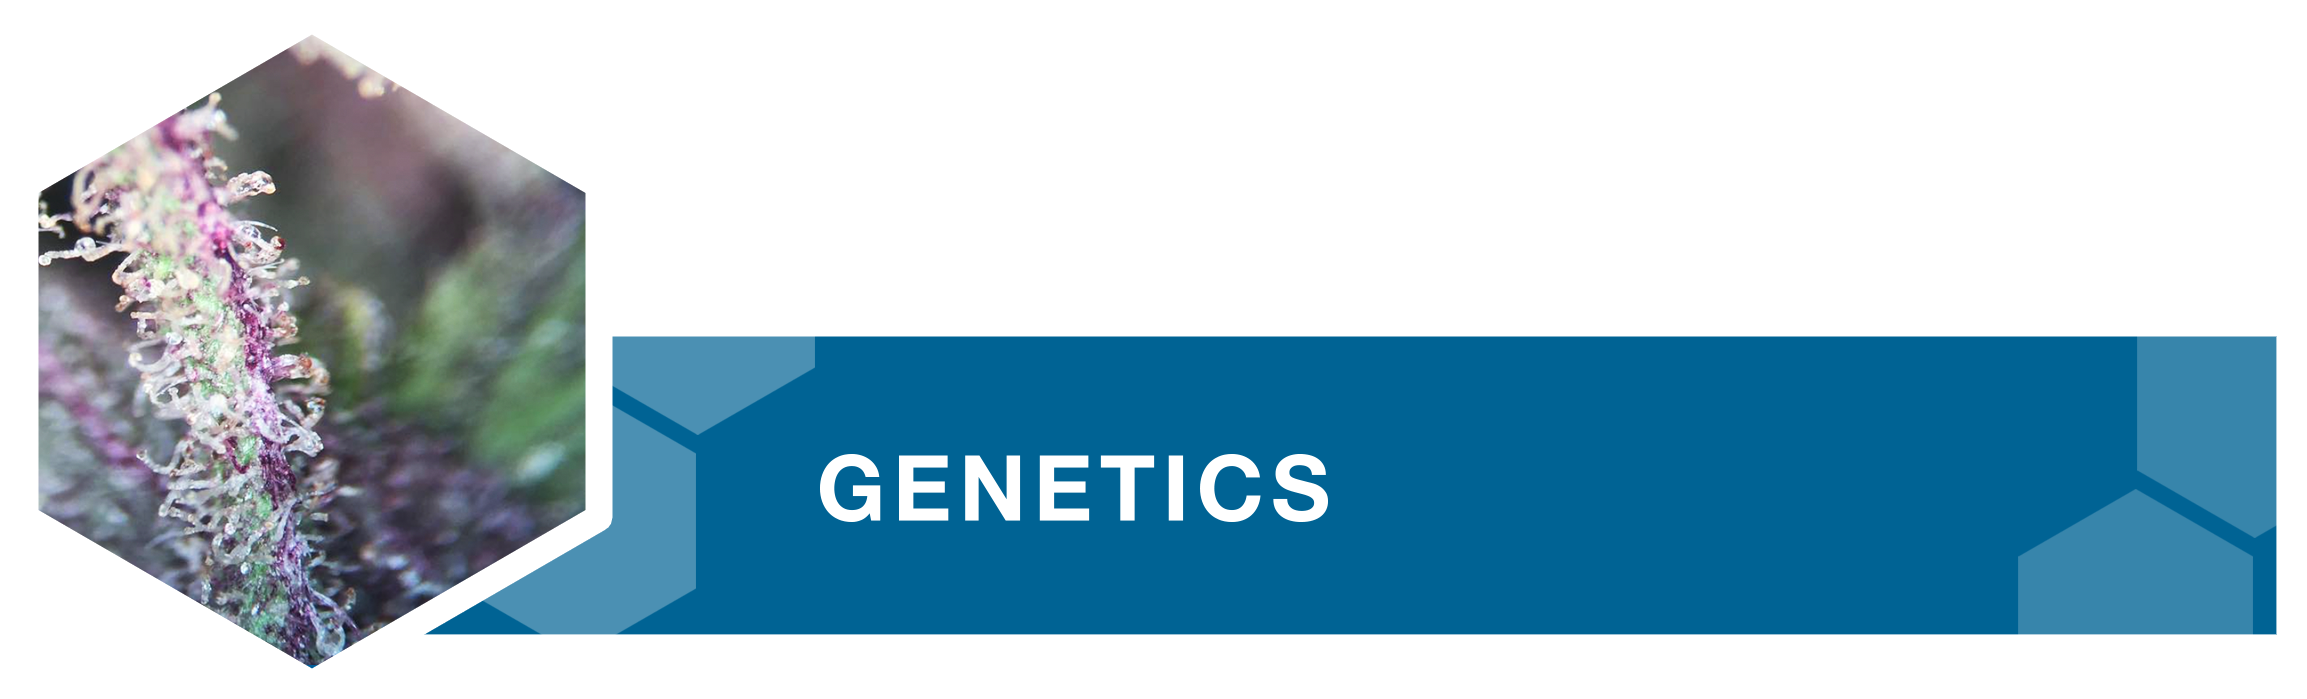 geneticsv4.png